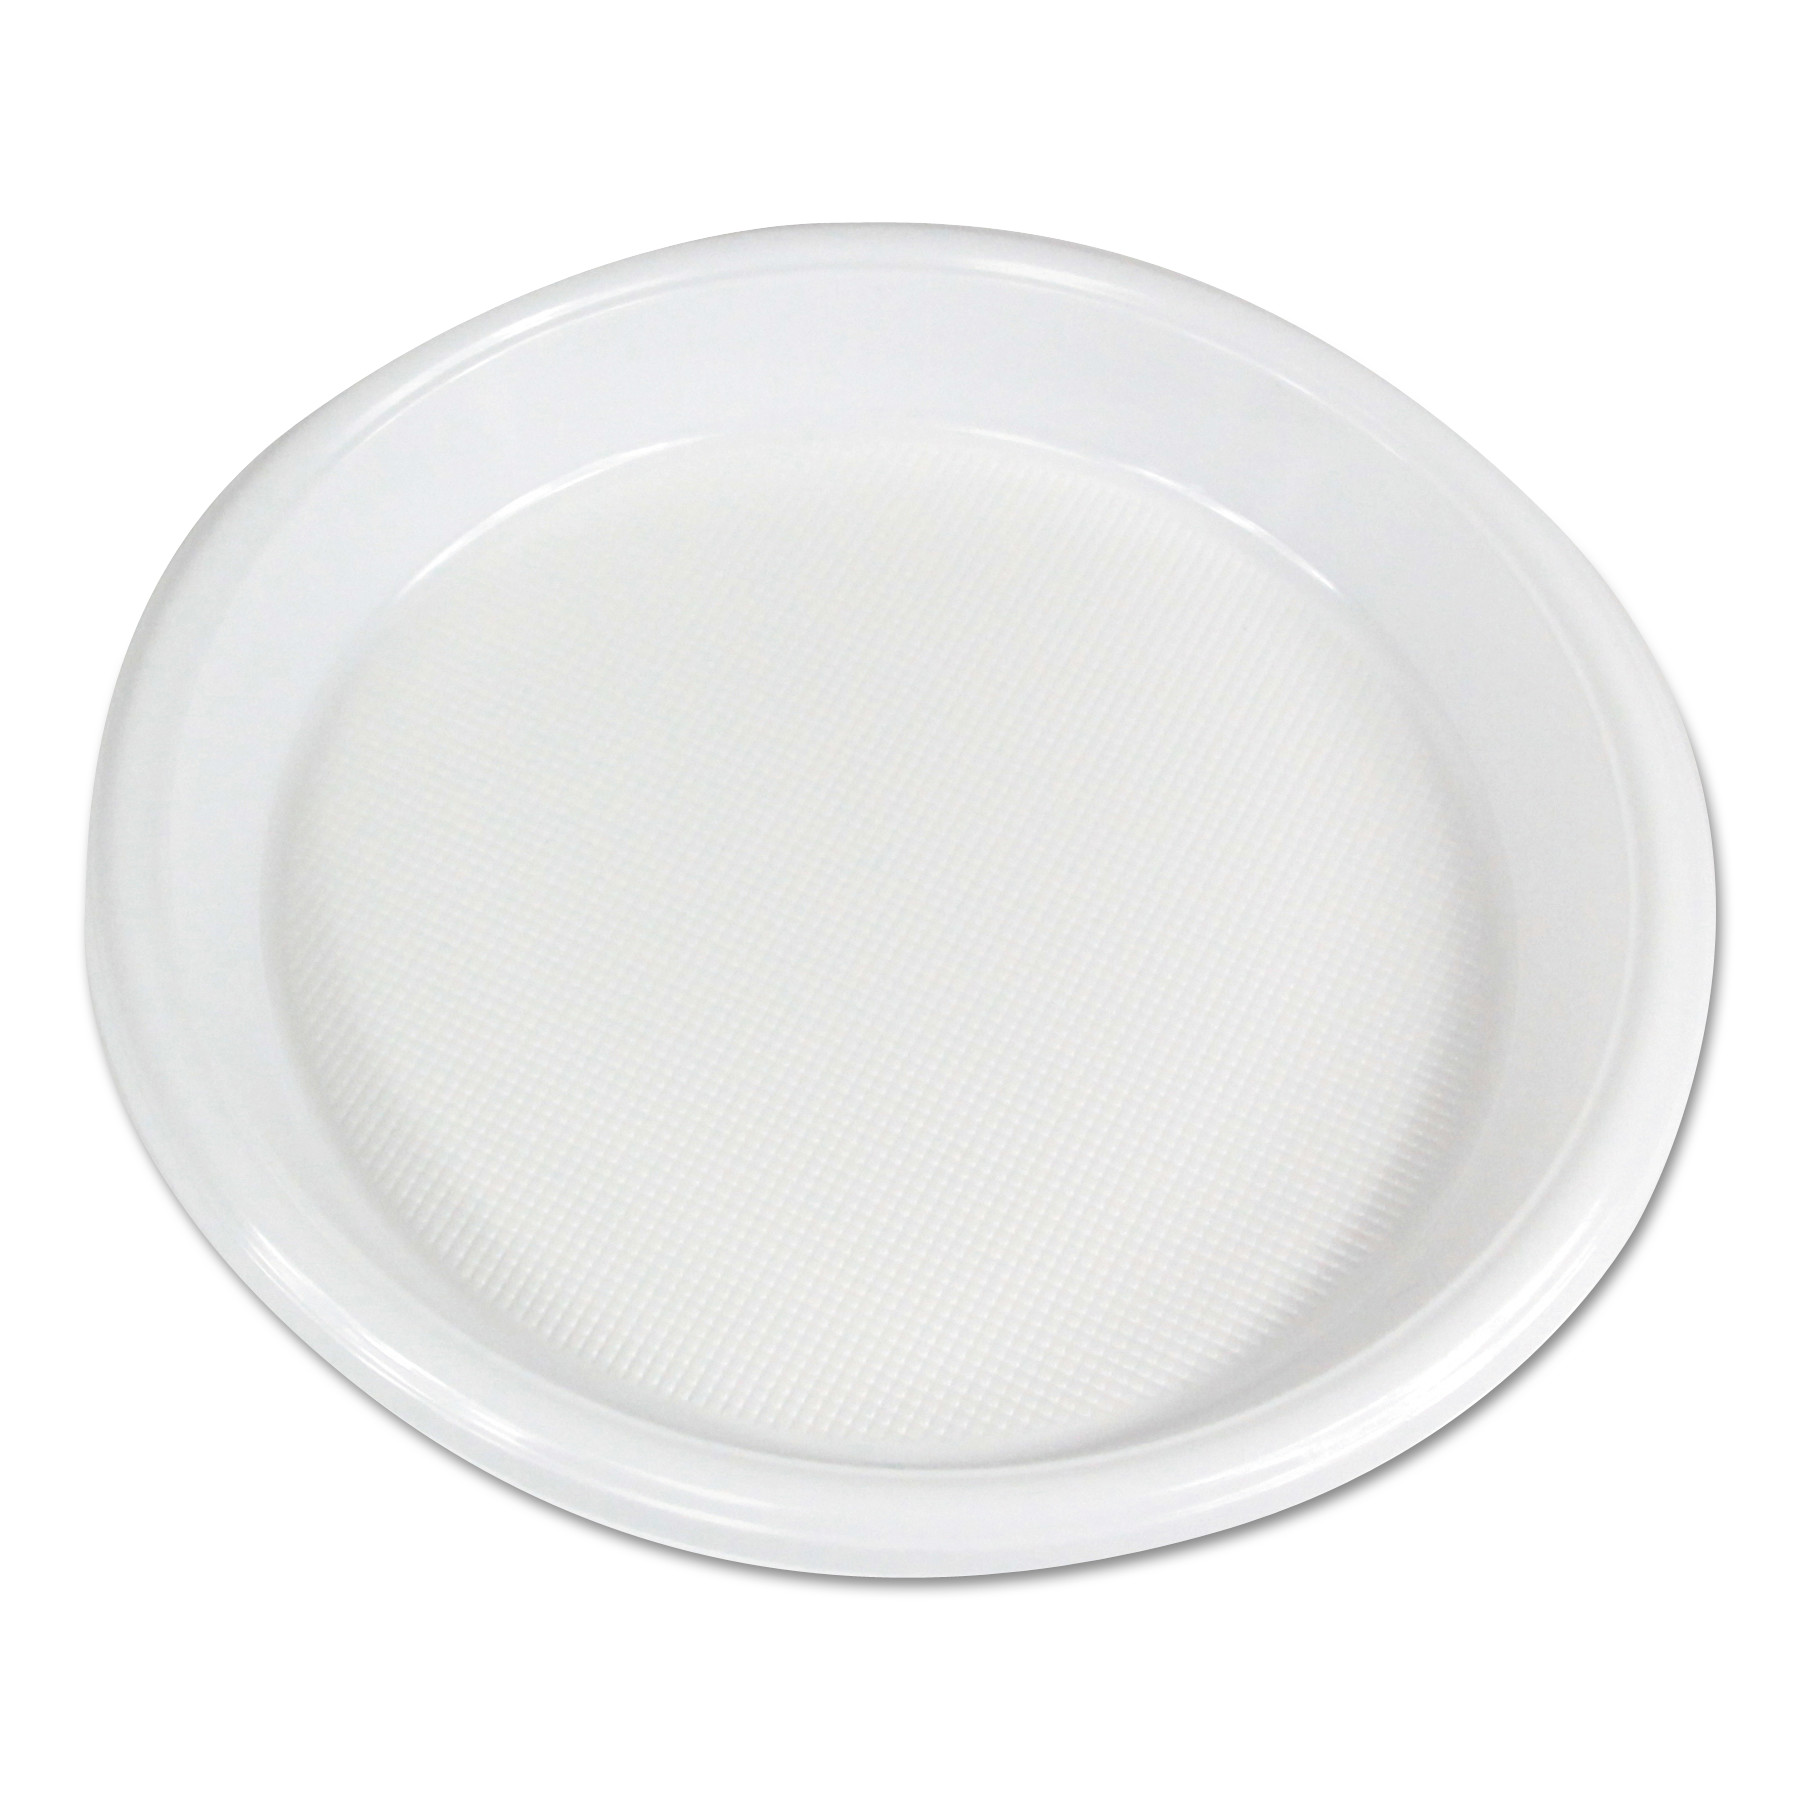 "Hi-Impact Plastic Dinnerware, Plate, 10"" Diameter, White, 500/Carton"